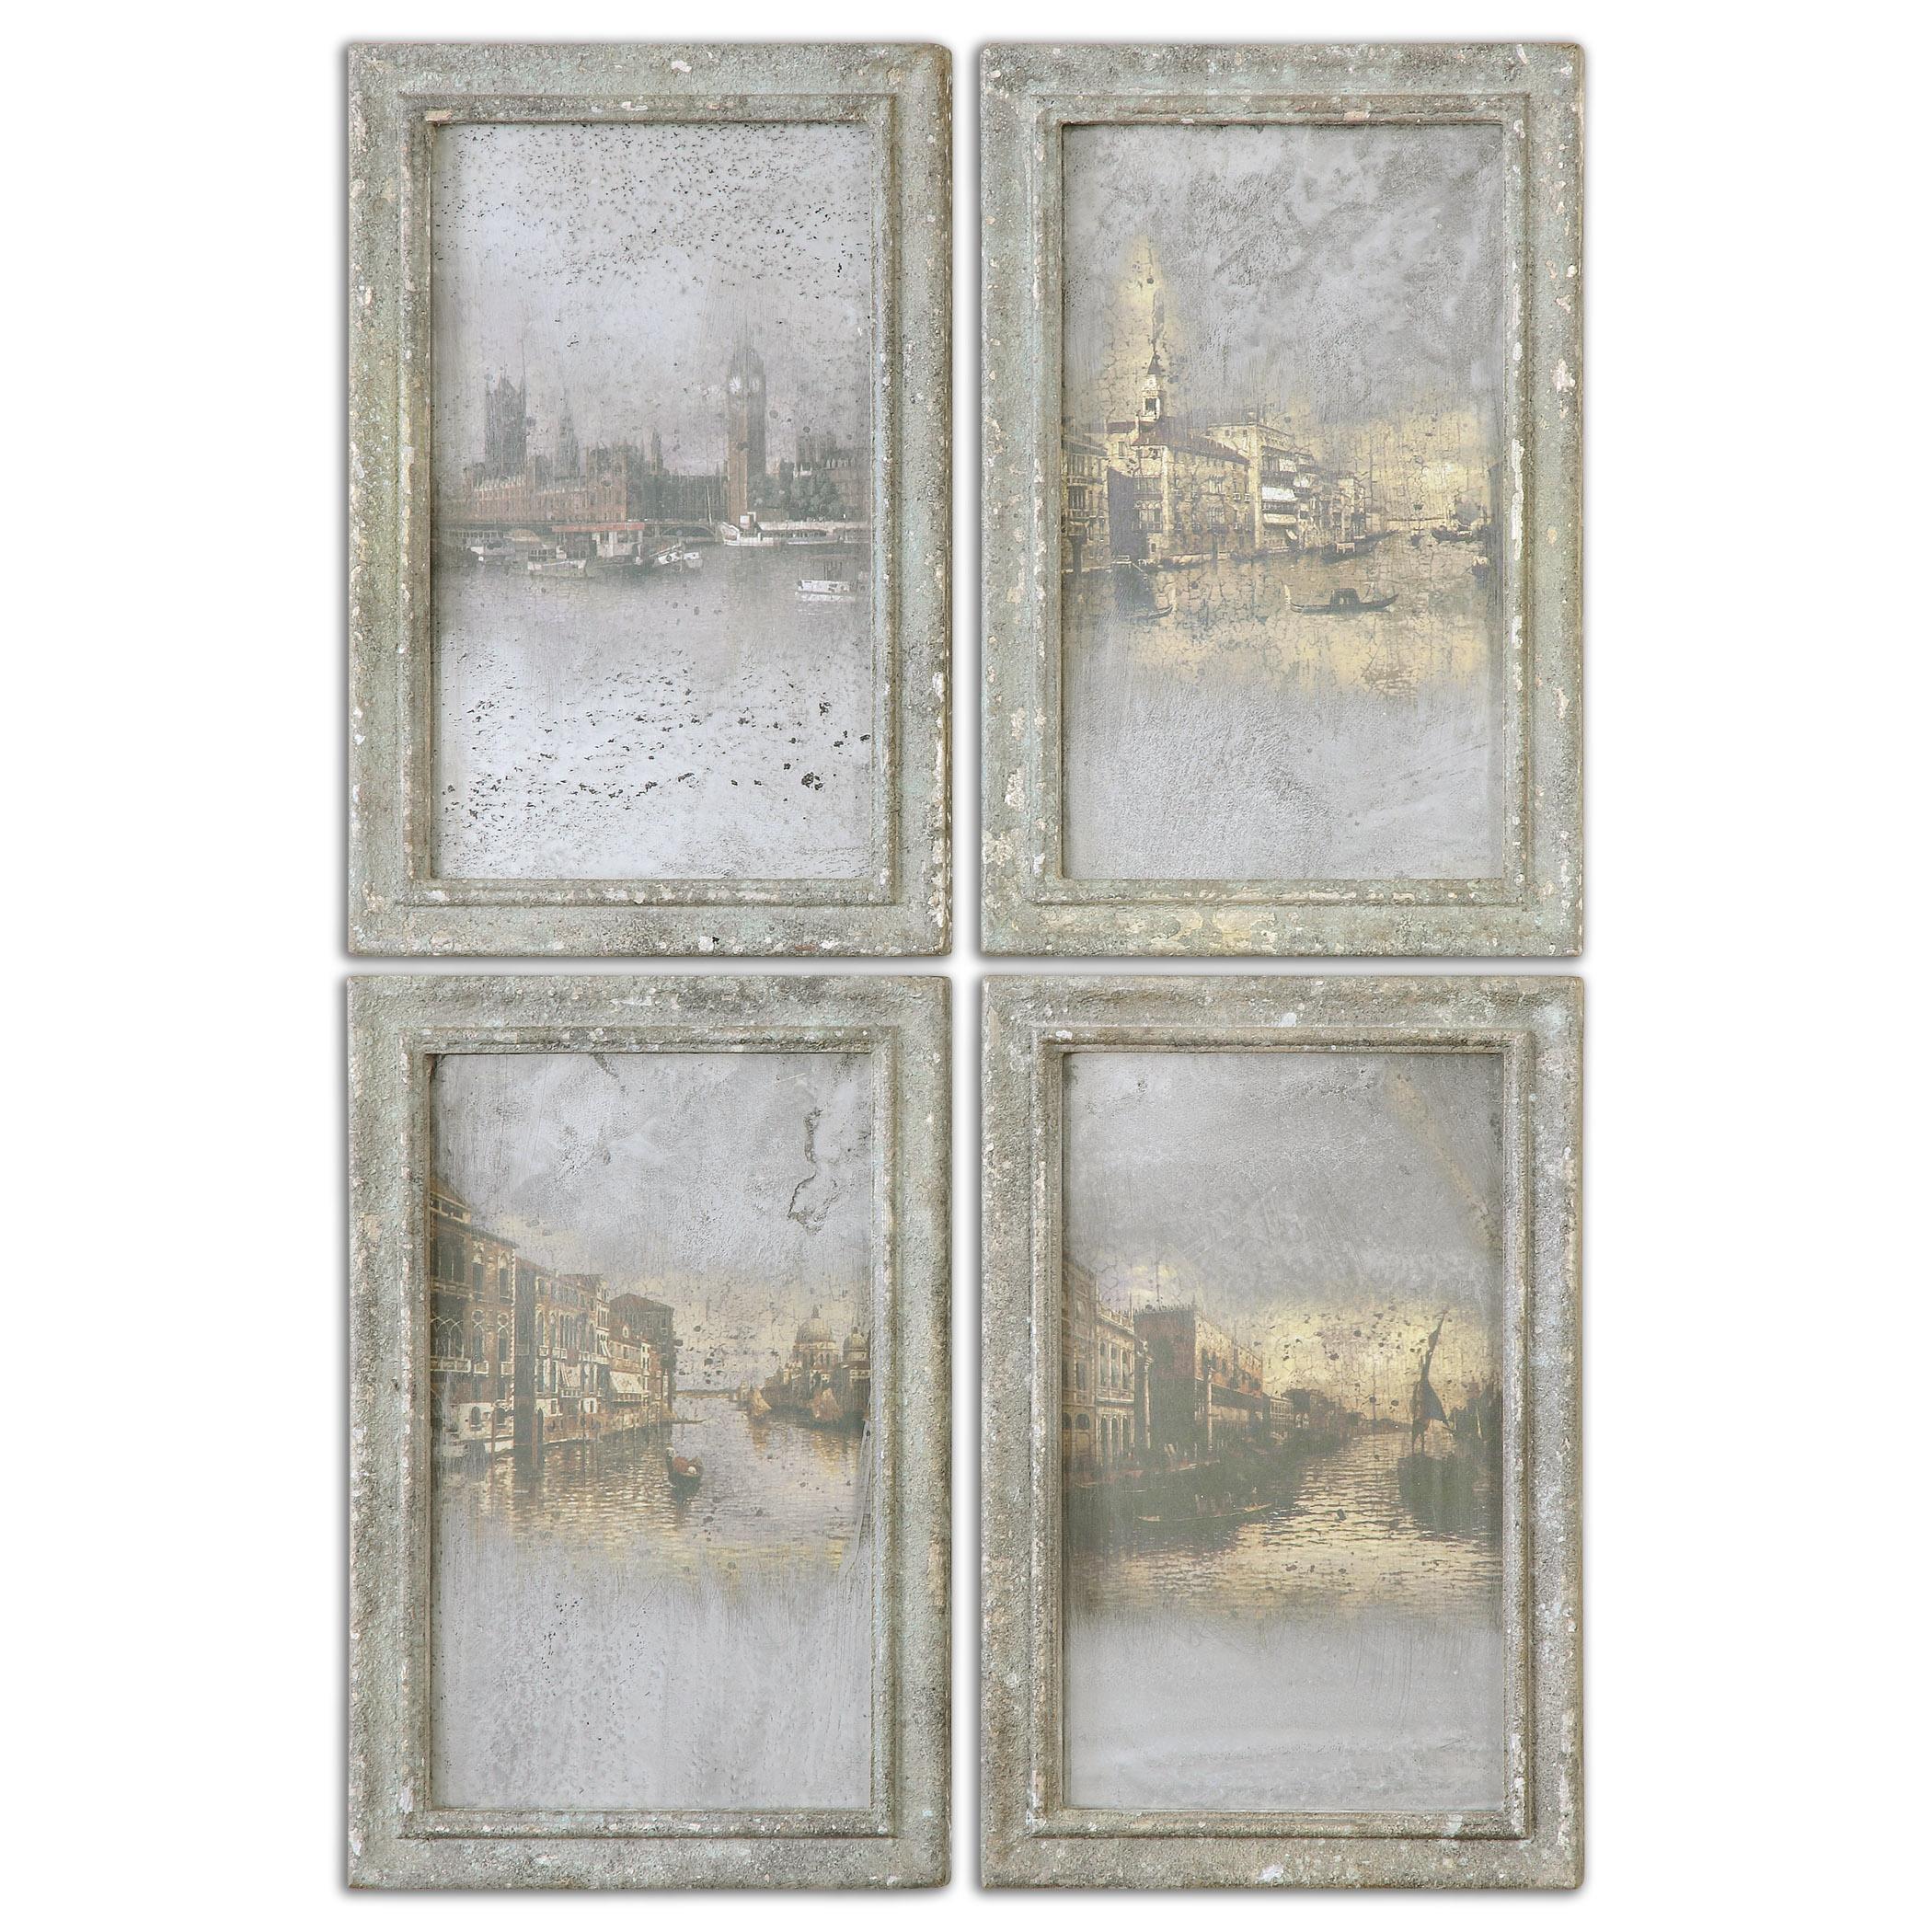 Uttermost Art Antique Venetian Views, Set of 4 - Item Number: 56050